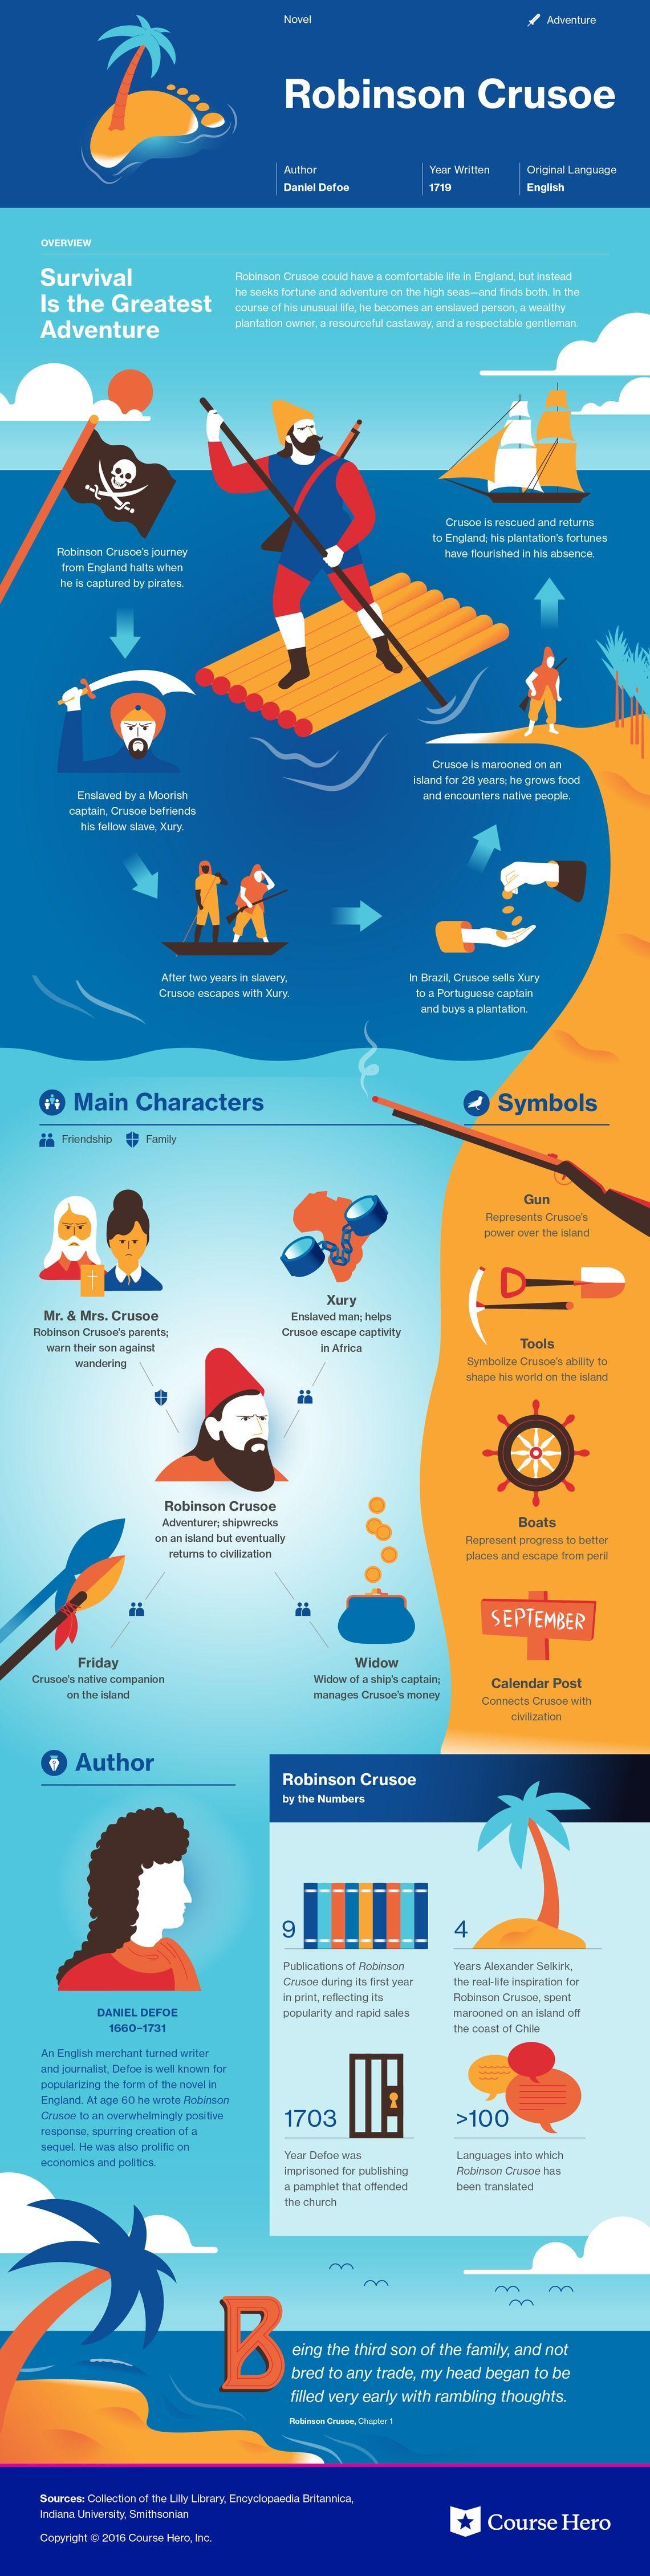 Robinson Crusoe Infographic